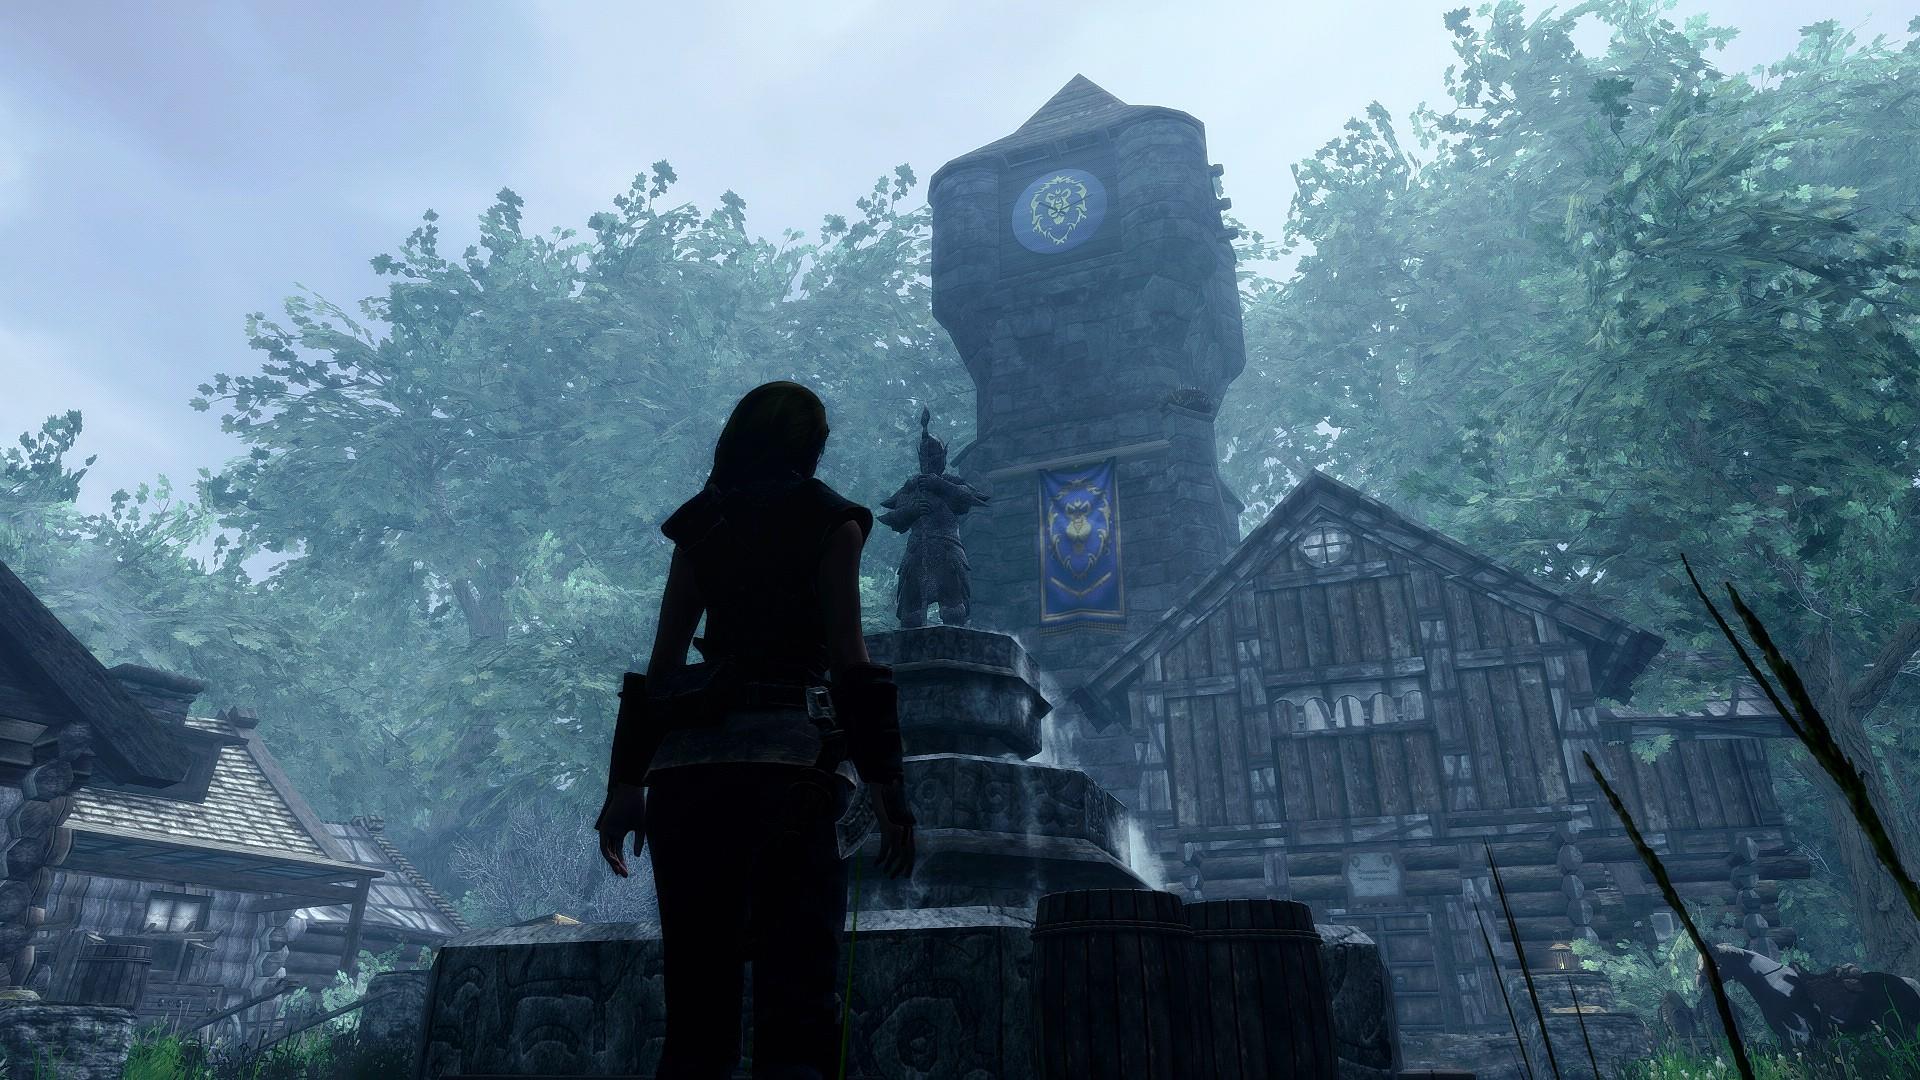 Azeroth in Skyrim Warcraft Mod Recreates Warcraft's Azeroth in